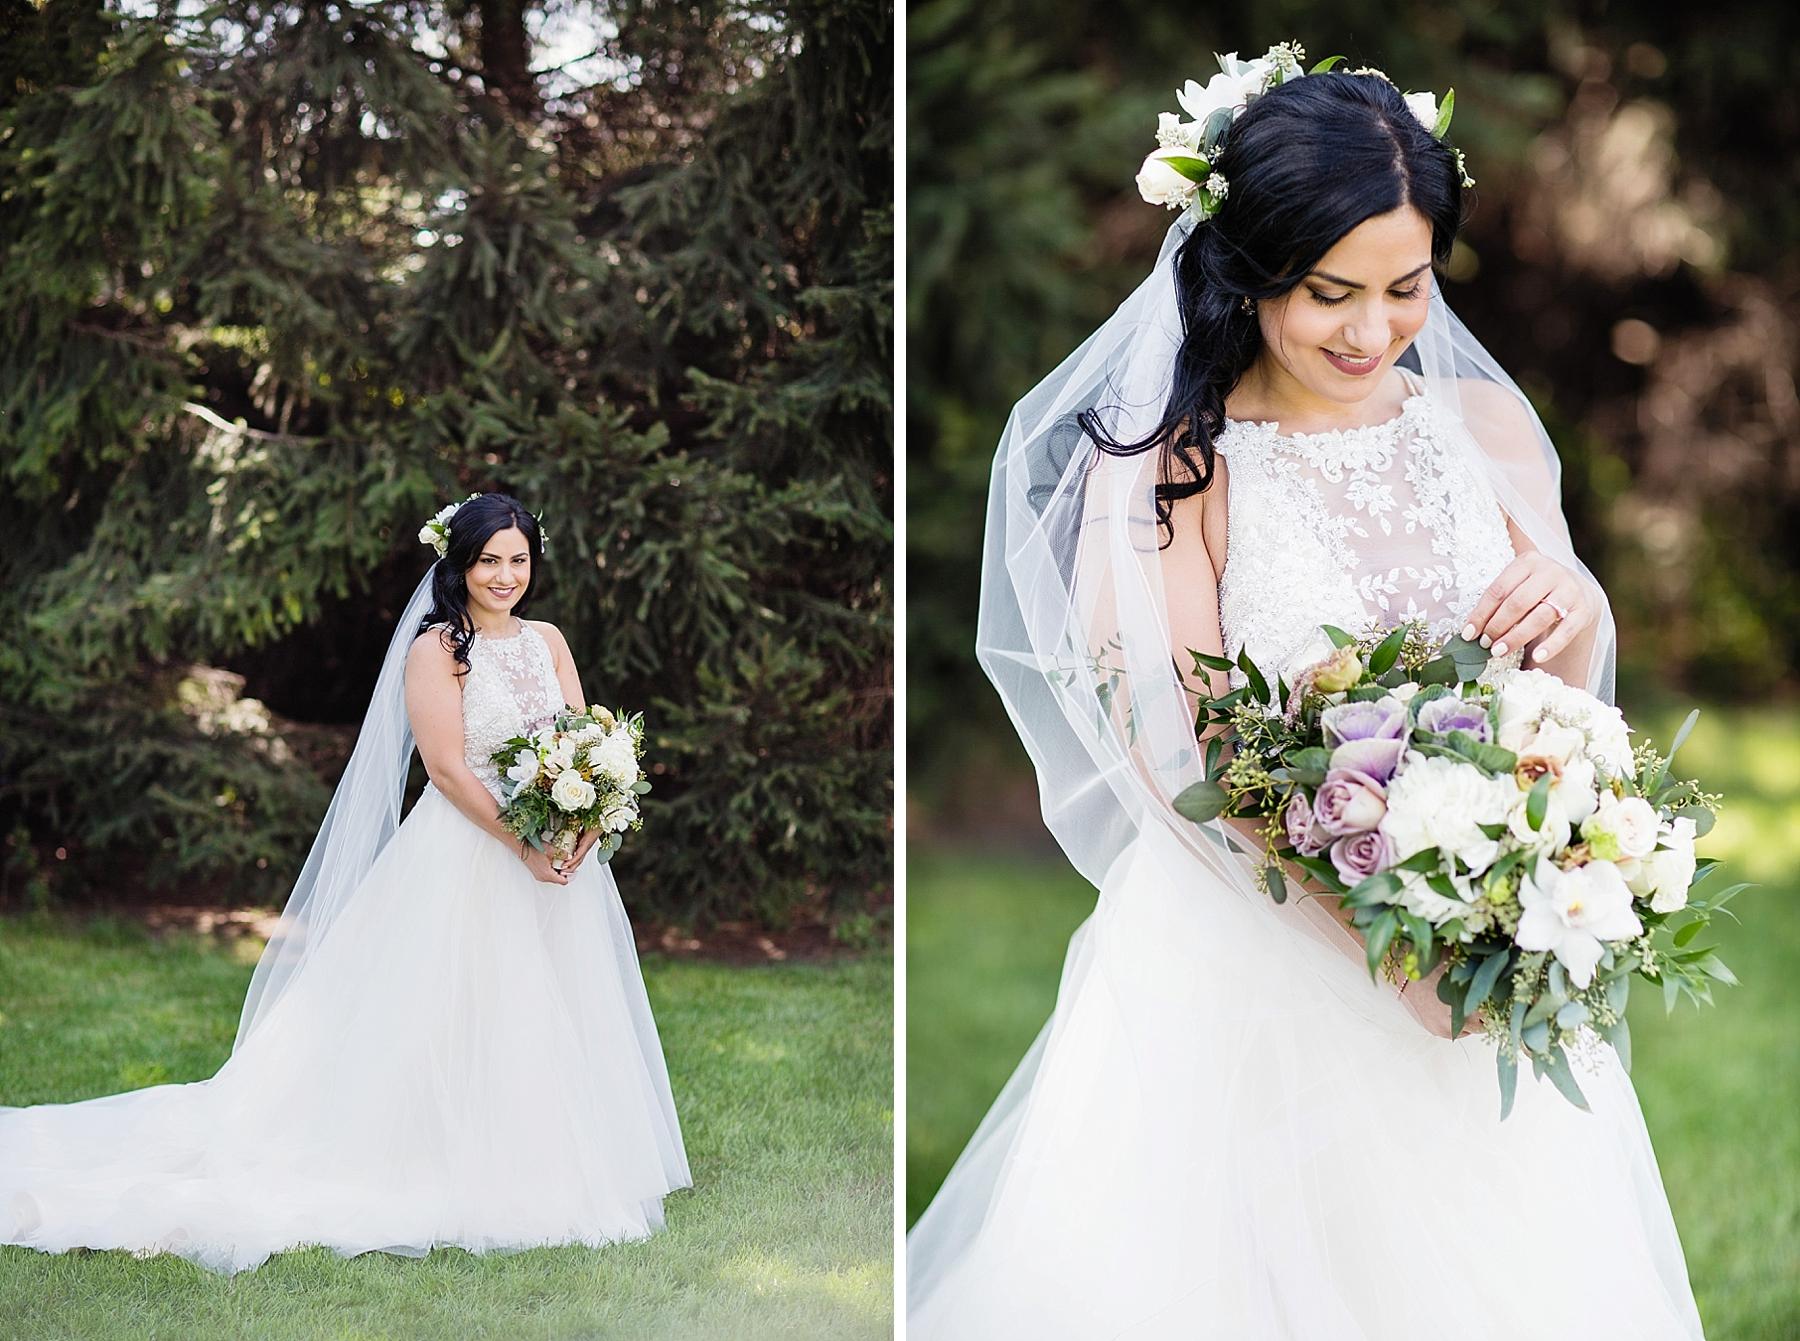 windsor-wedding-photographer-sprucewood-shores-winery-wedding-niagara-on-the-lake-wedding-photographer-eryn-shea-photography_0017.jpg